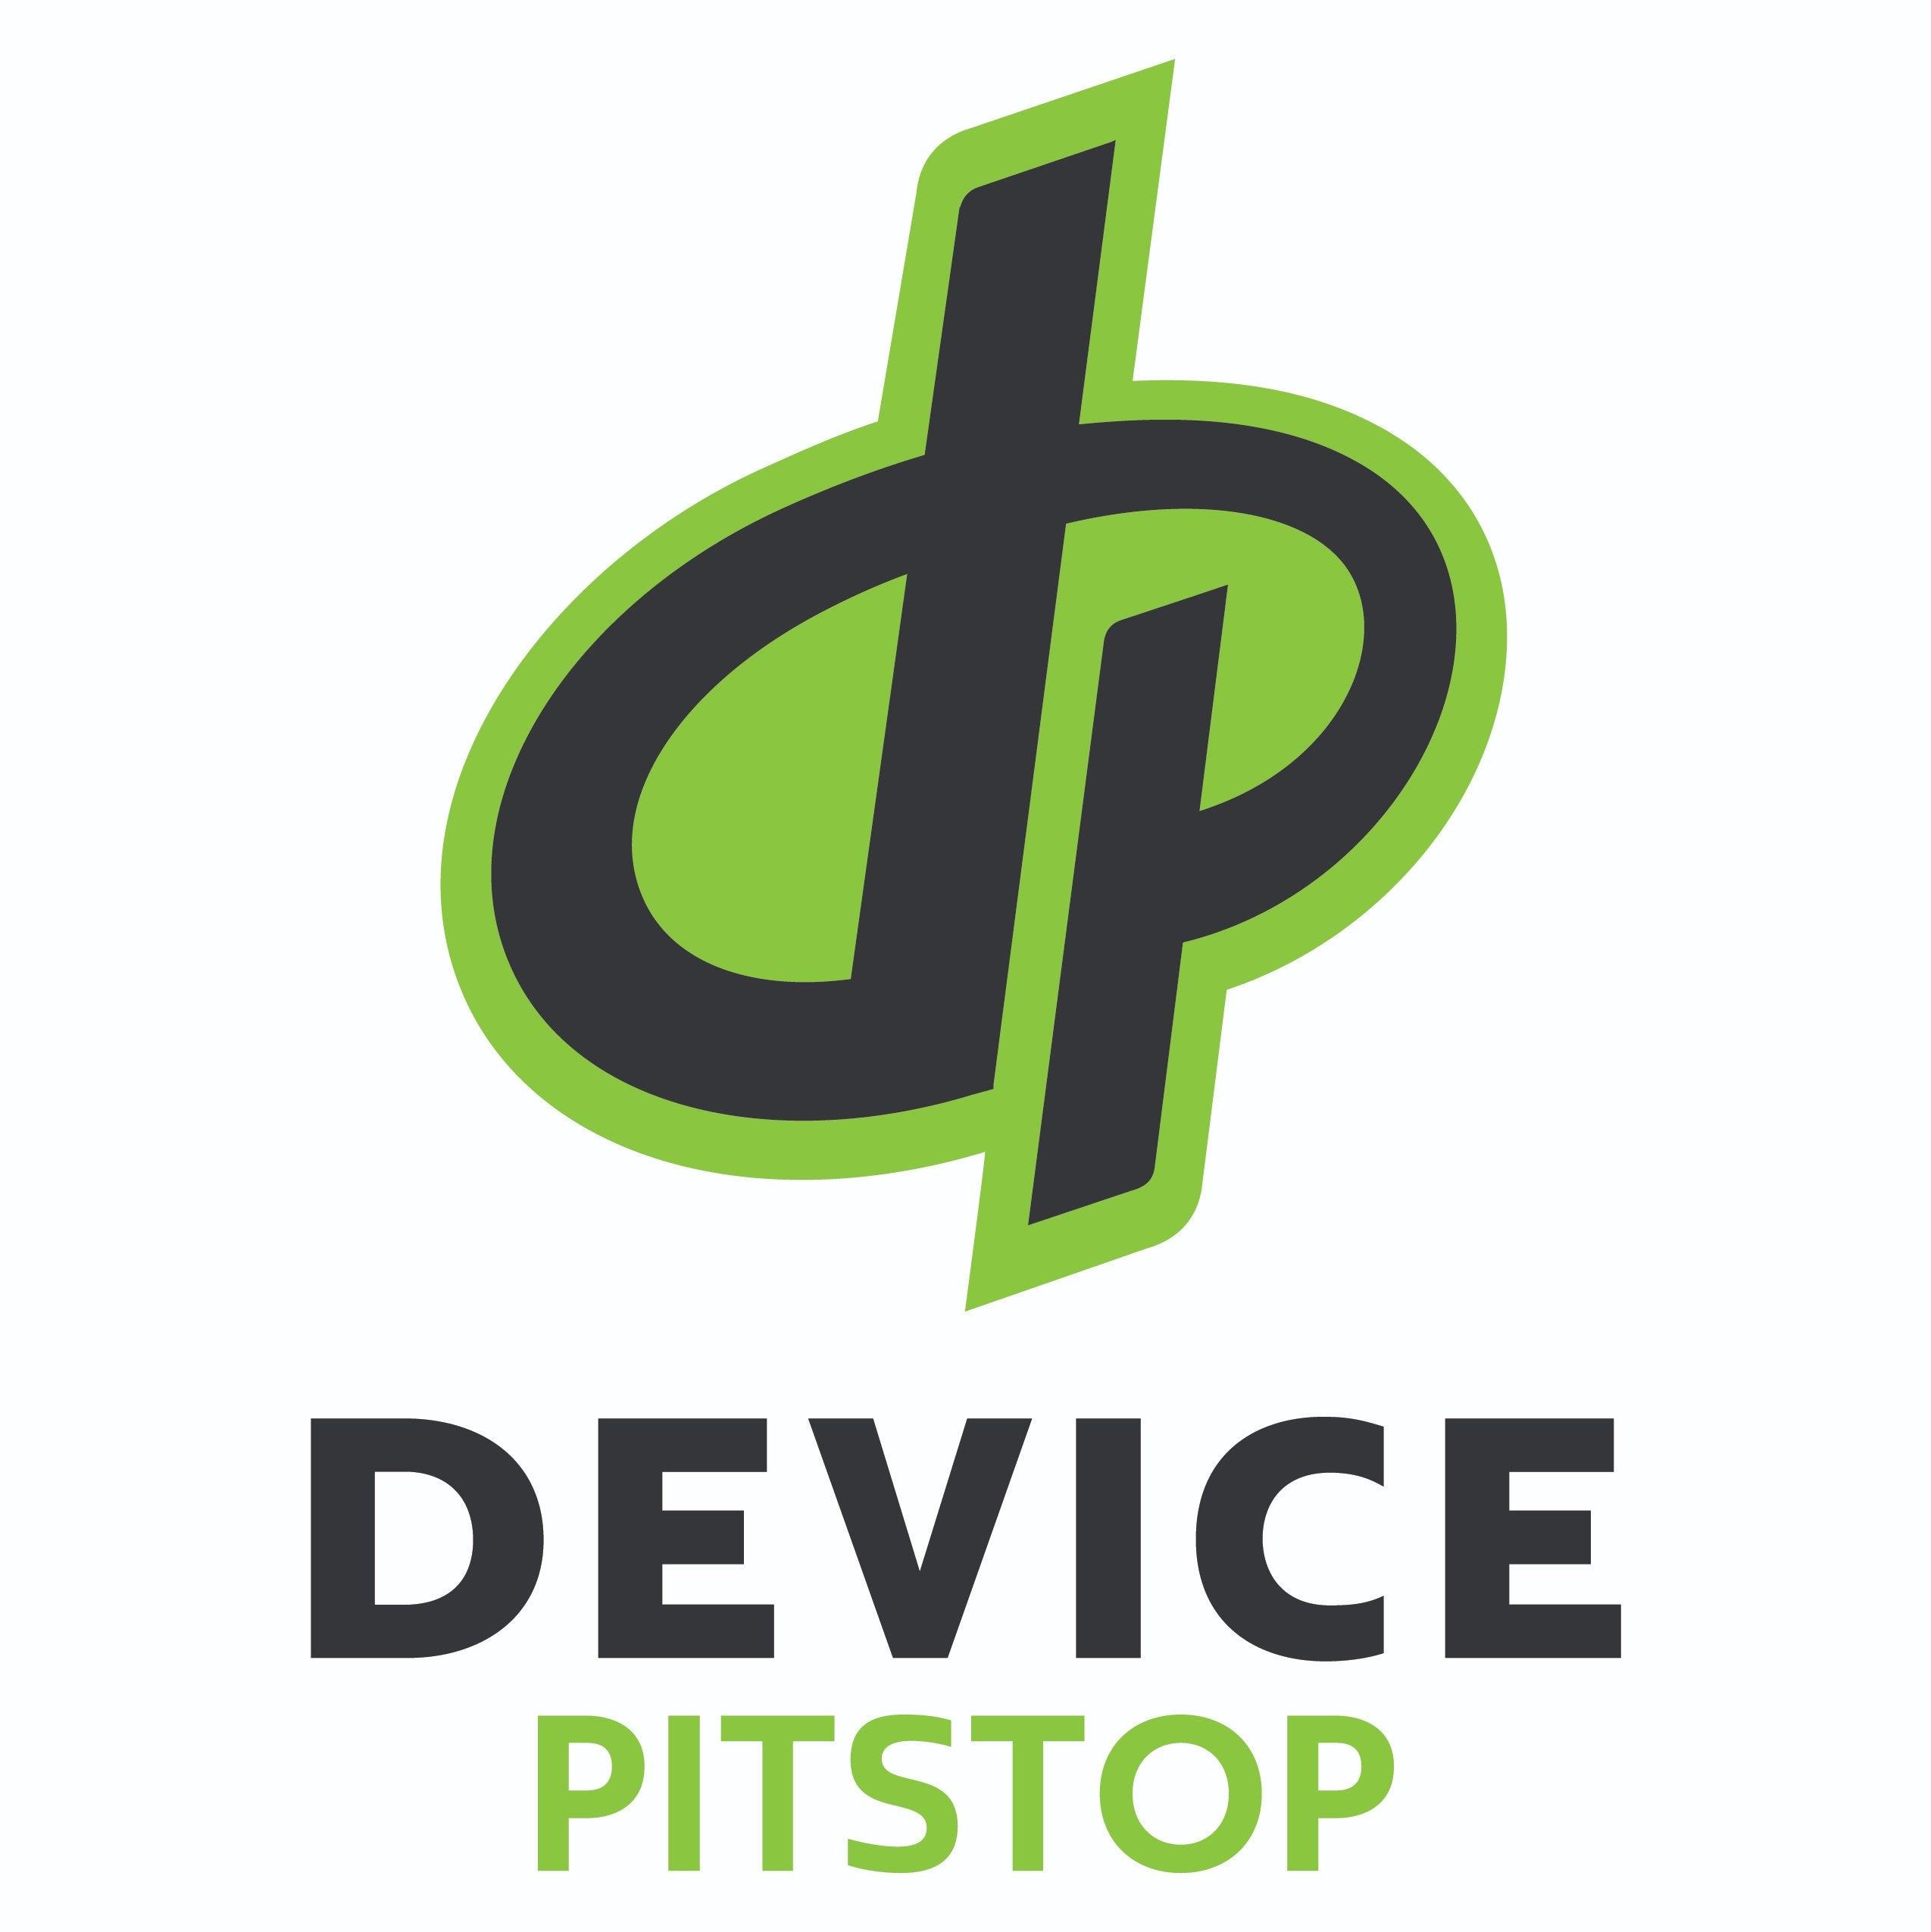 Device Pitstop LLC